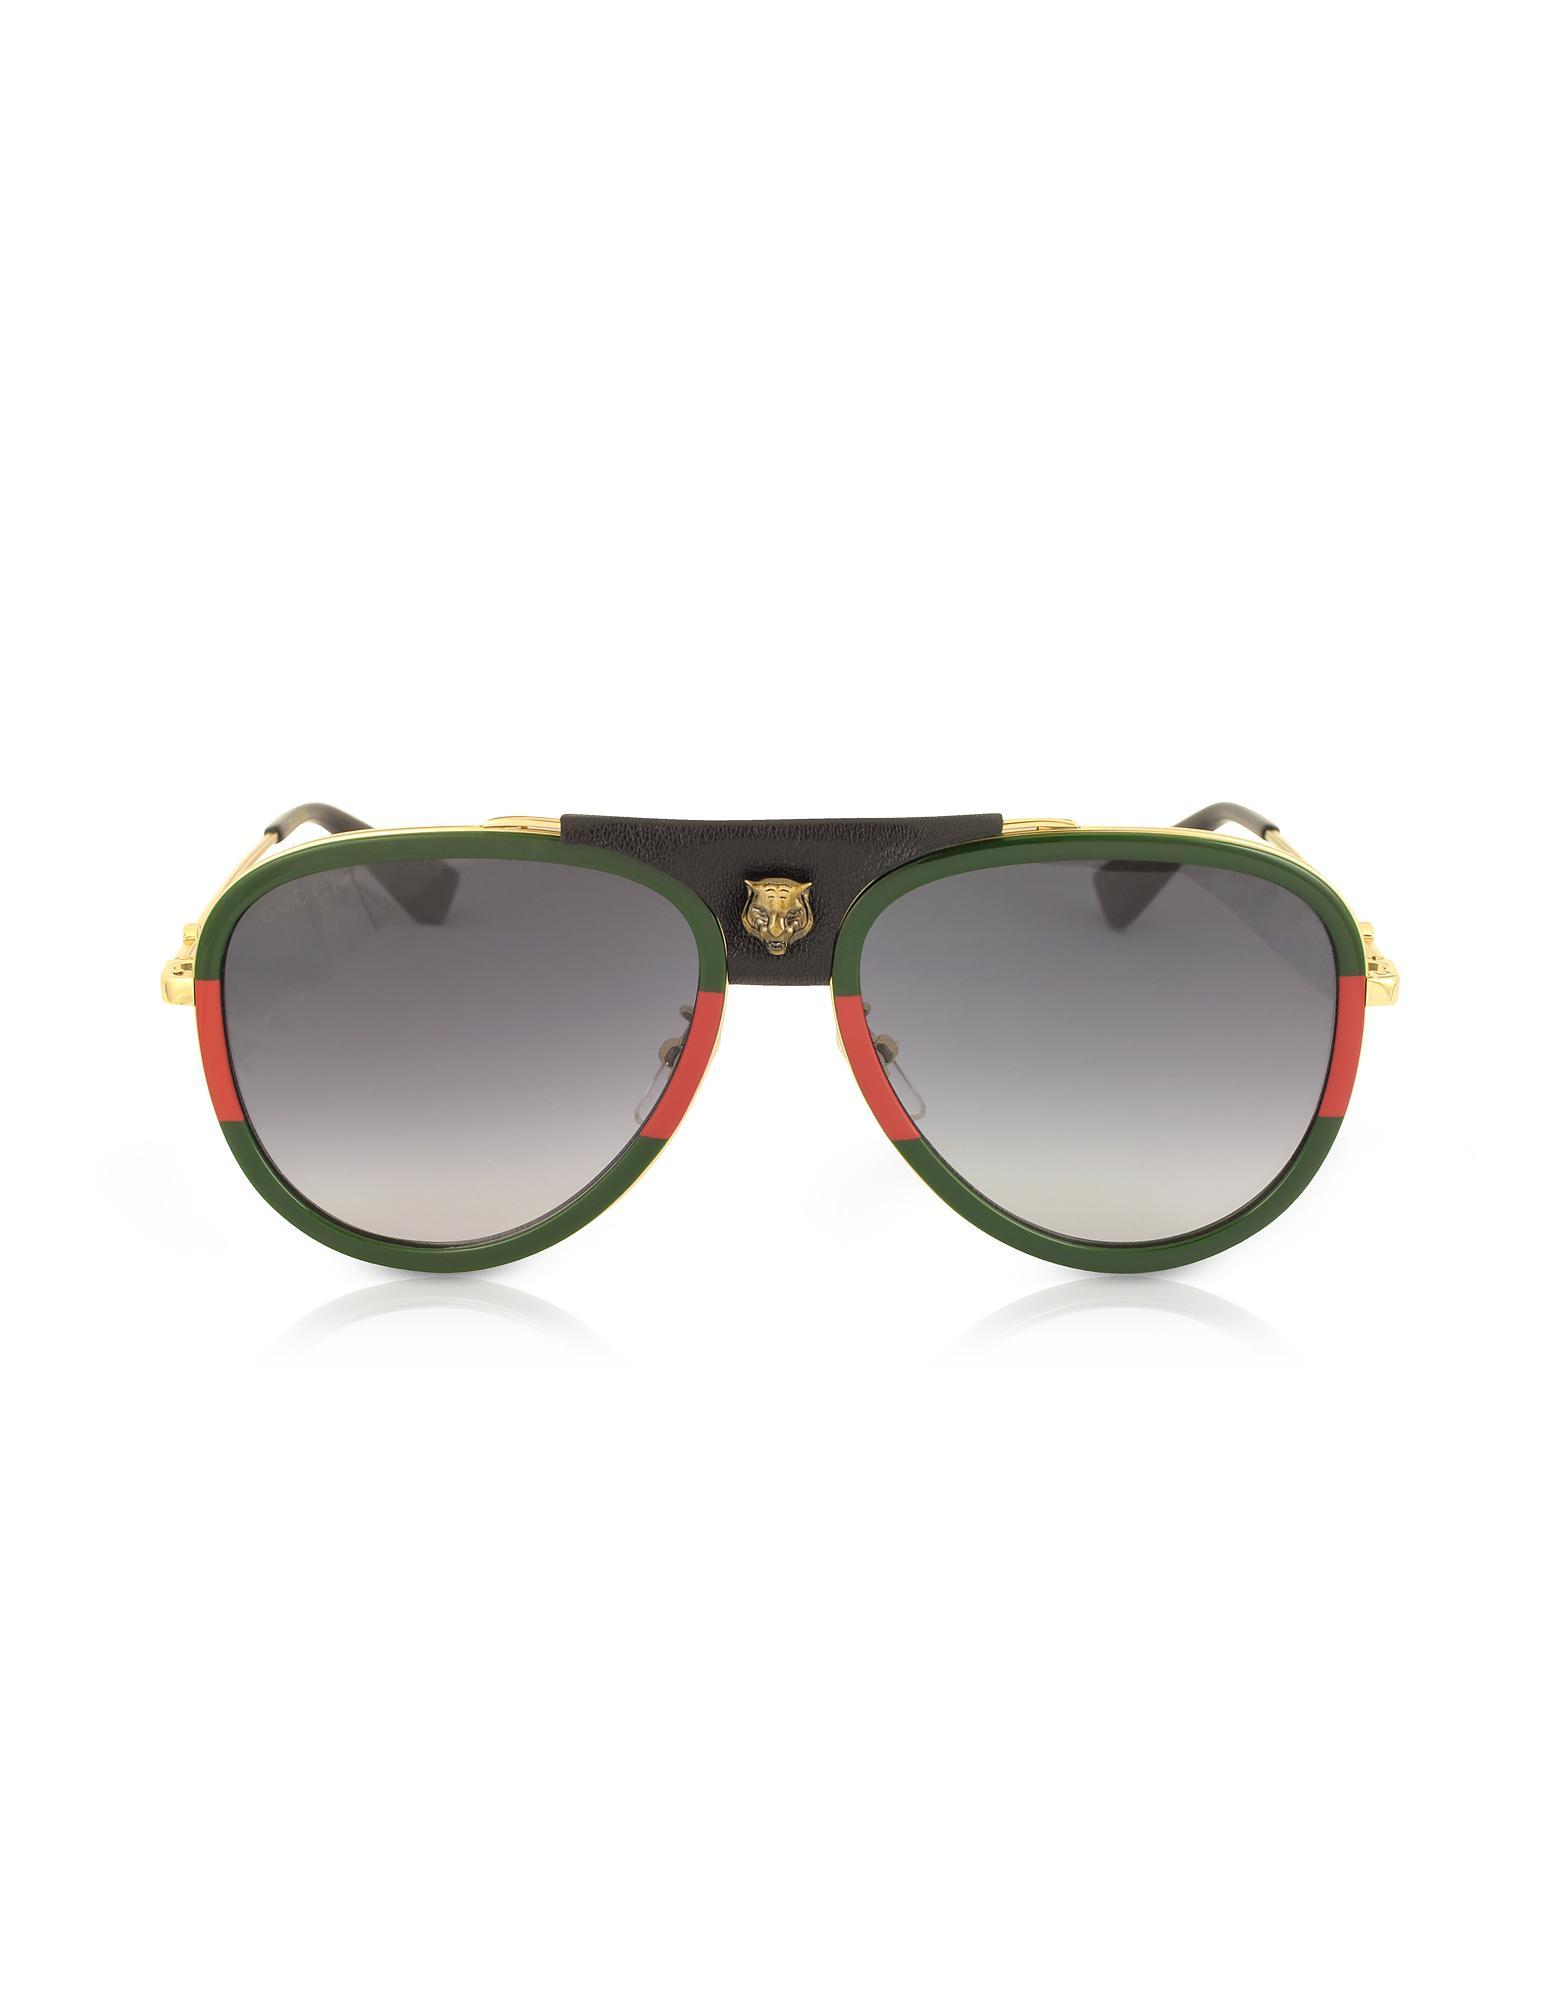 Gucci. Men s Metallic GG0062S Aviator Gold Metal And Black Leather  Sunglasses 75fe16bb6e